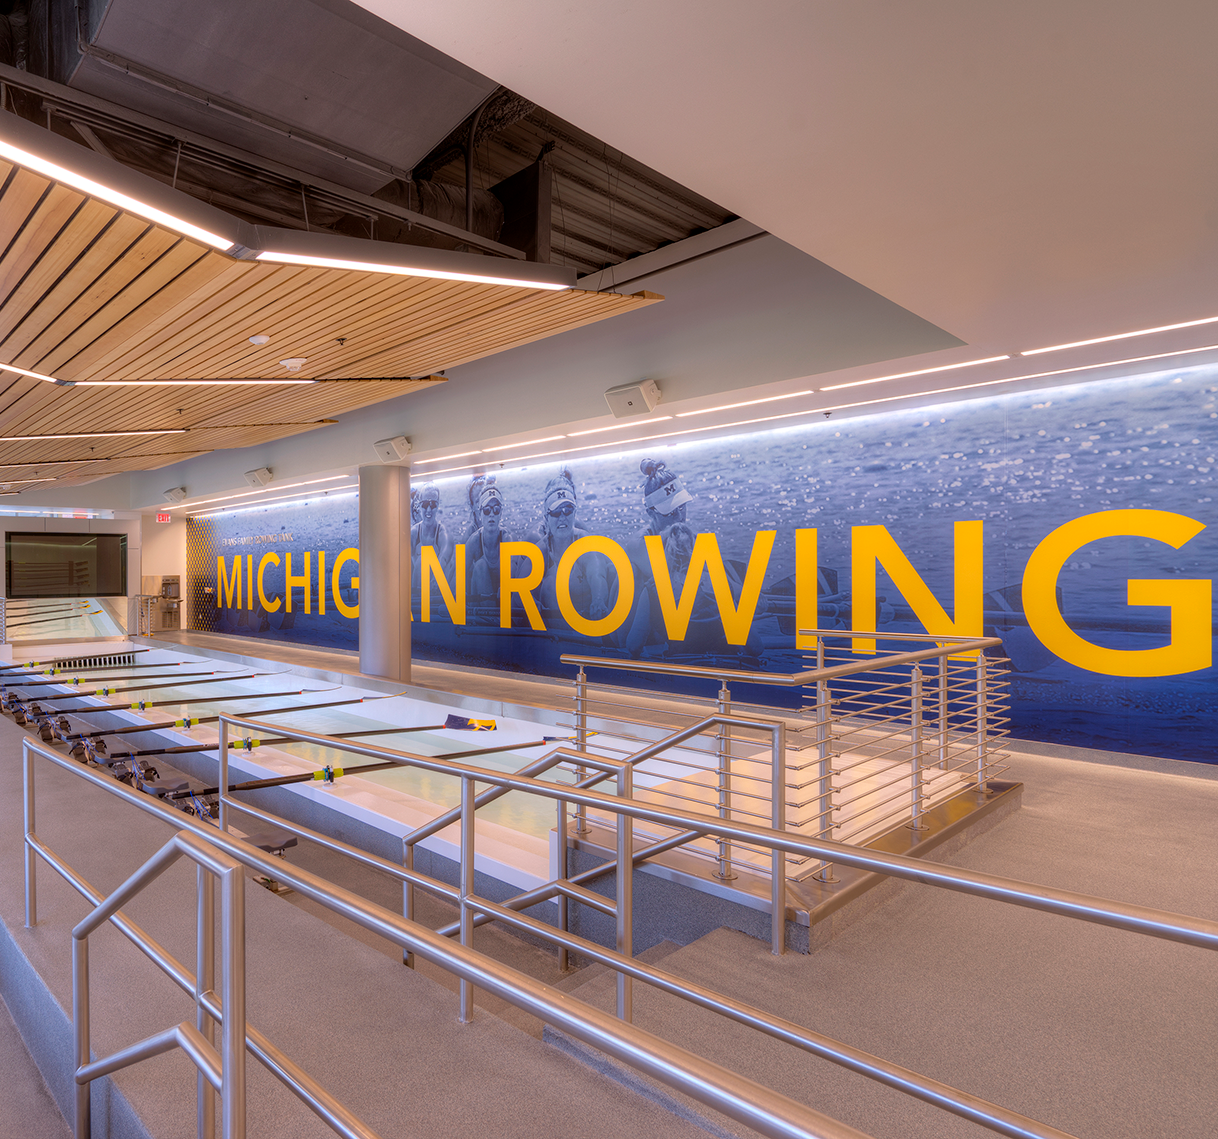 UofM_Rowing_Image